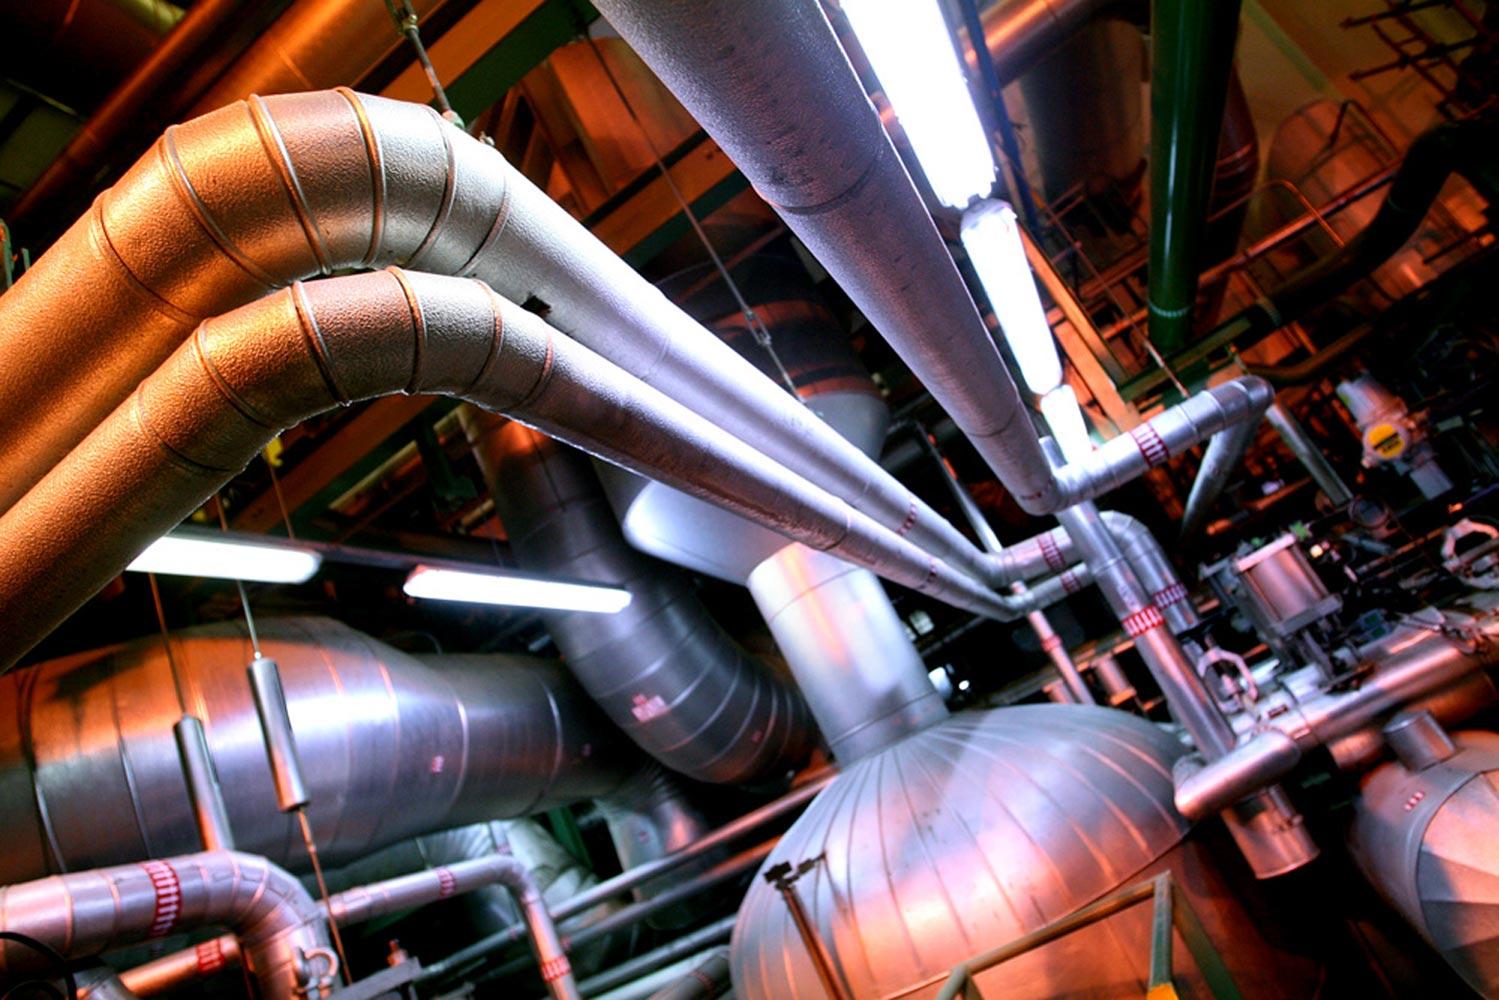 01-industrial-turbina-cicle-combinat-alstom-003